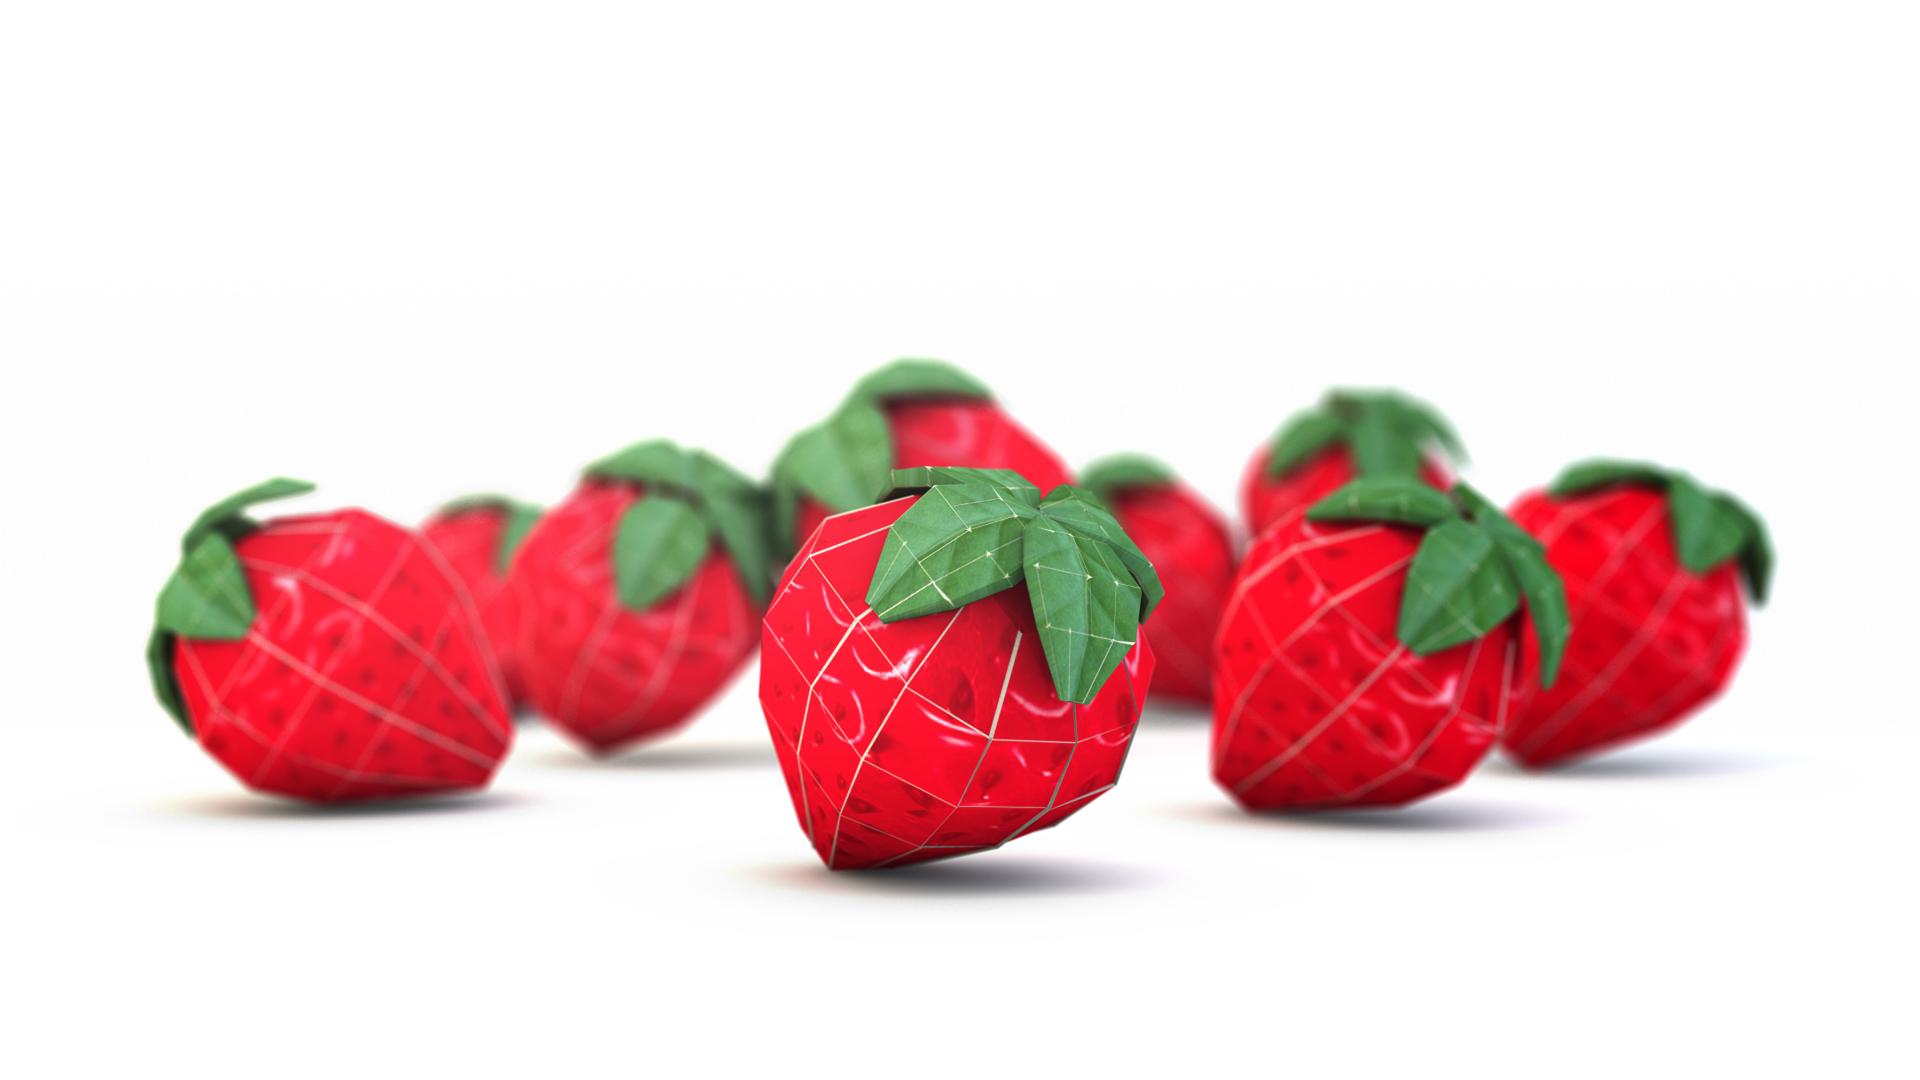 ziplock_strawberries_02.jpg